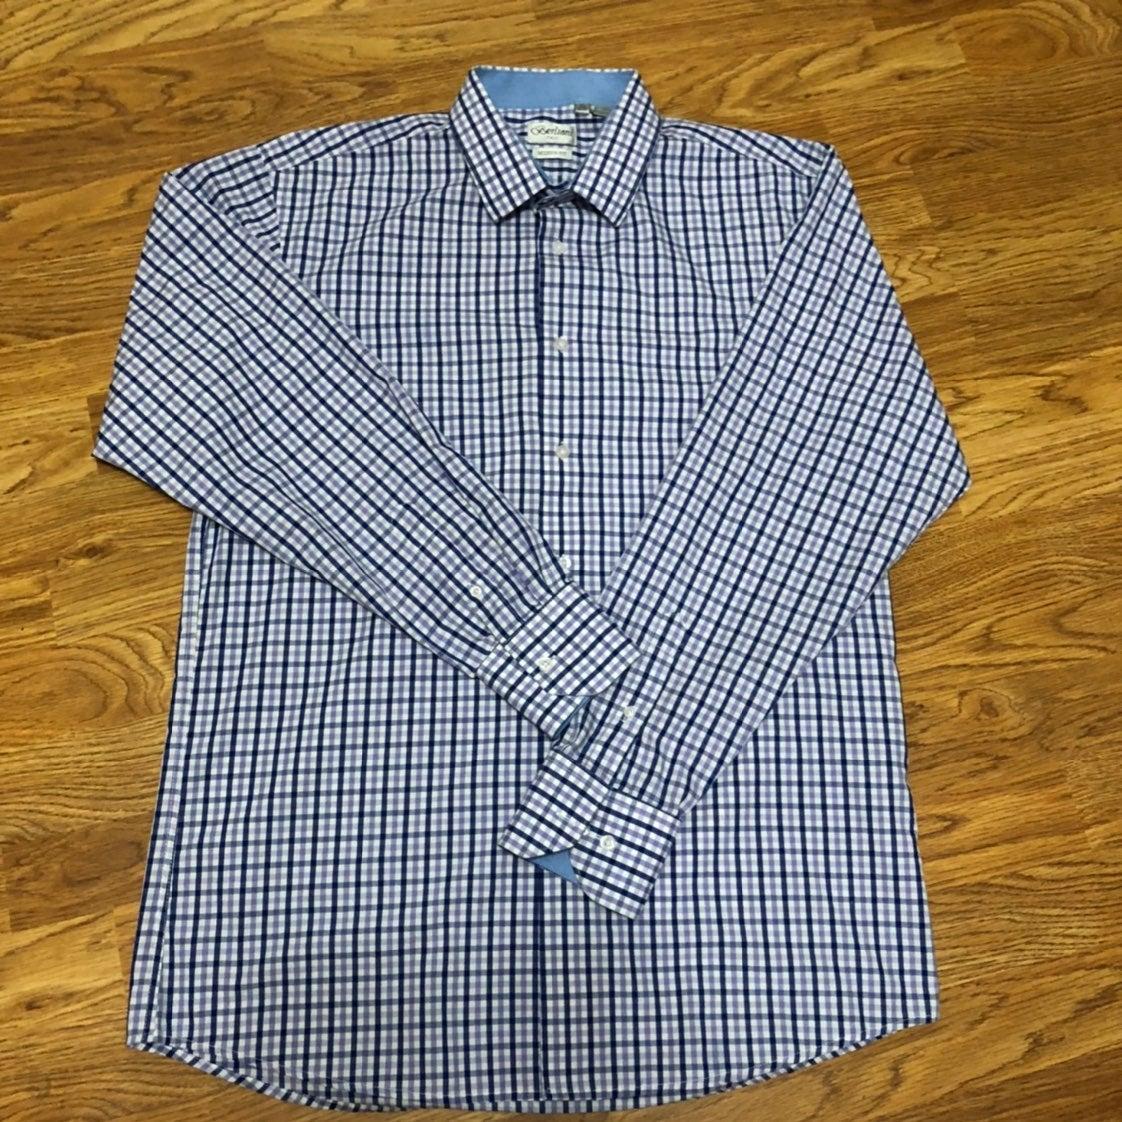 Berlioni Mens Dress Shirt